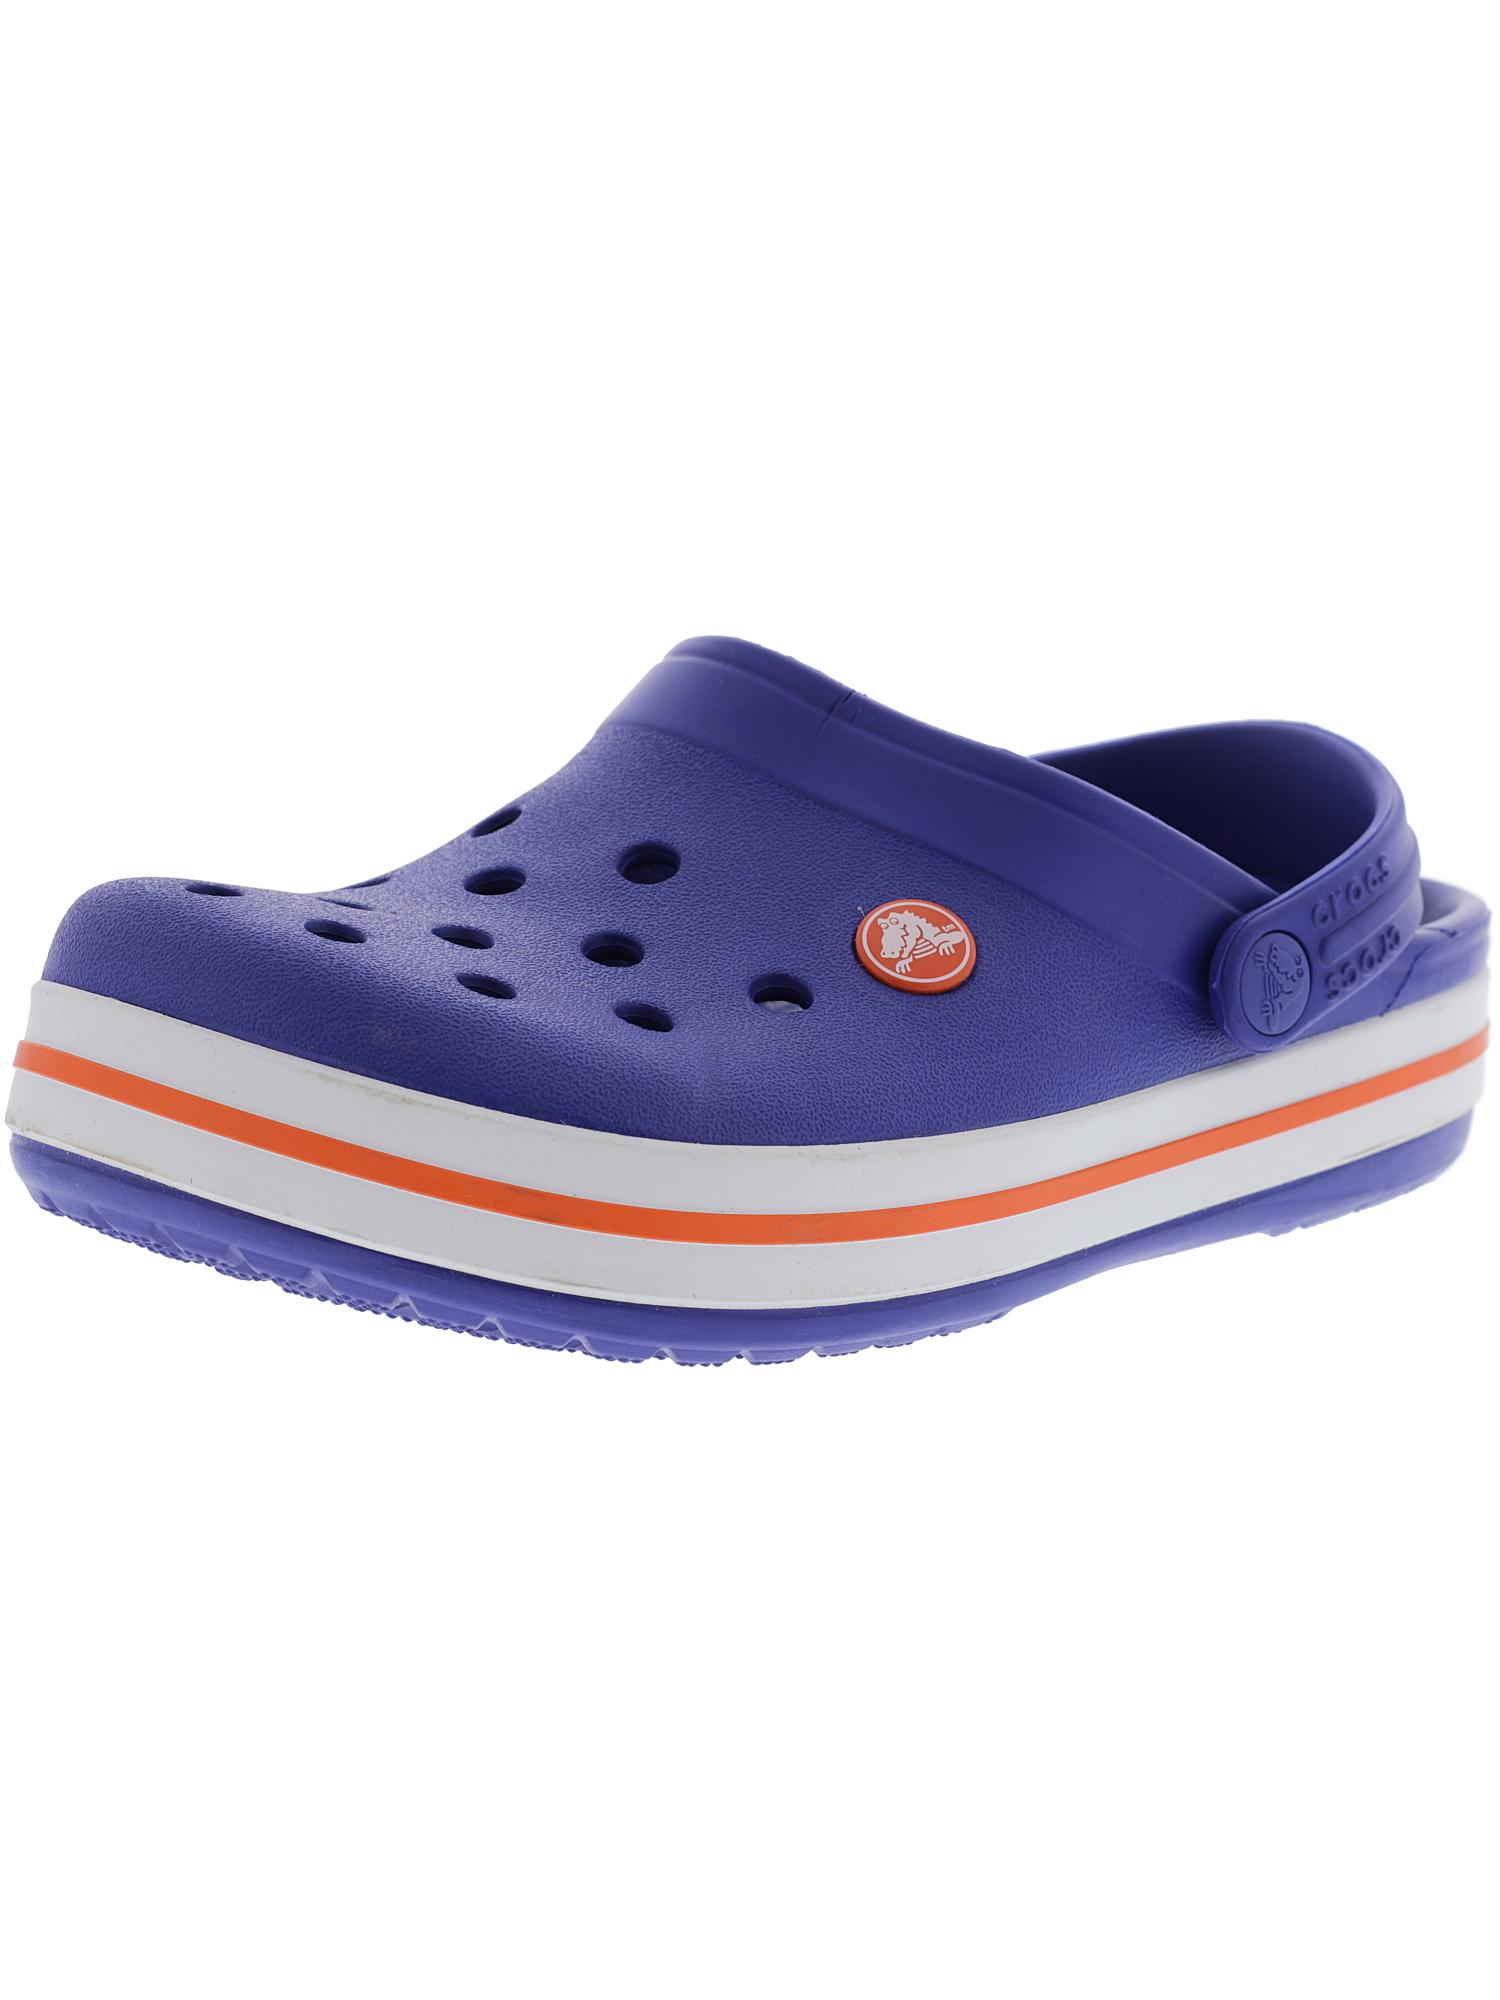 Crocs-Kids-Crocband-Clog-Ltd-Clogs Indexbild 2